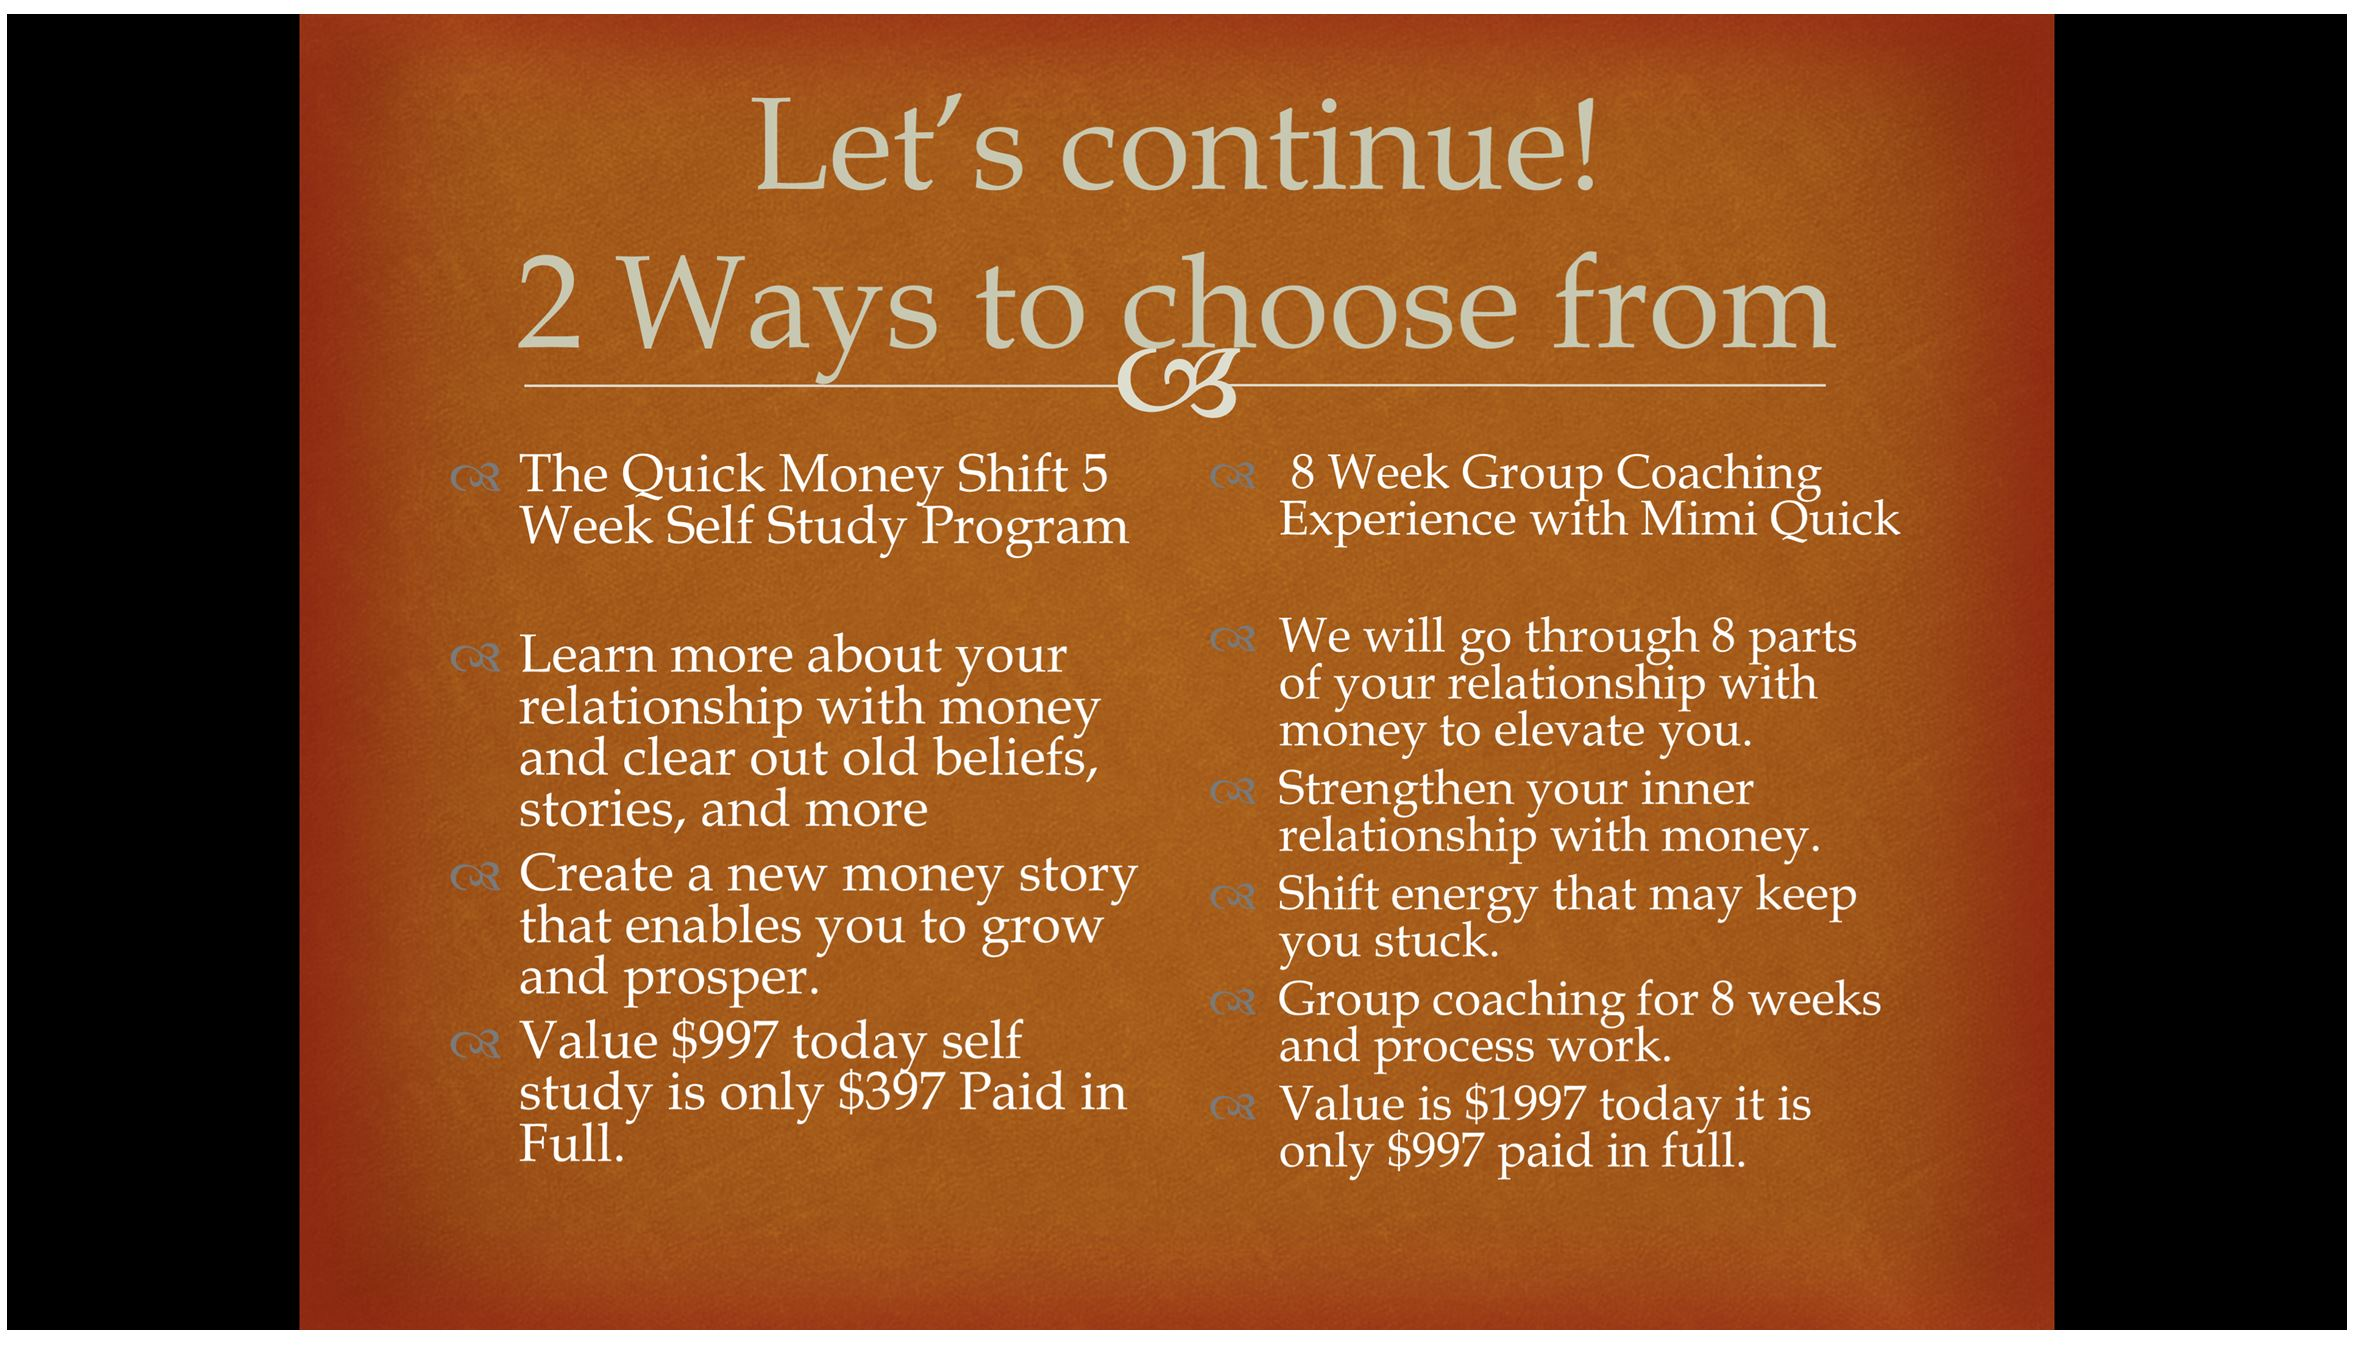 Picture for Money Program Offers.JPG